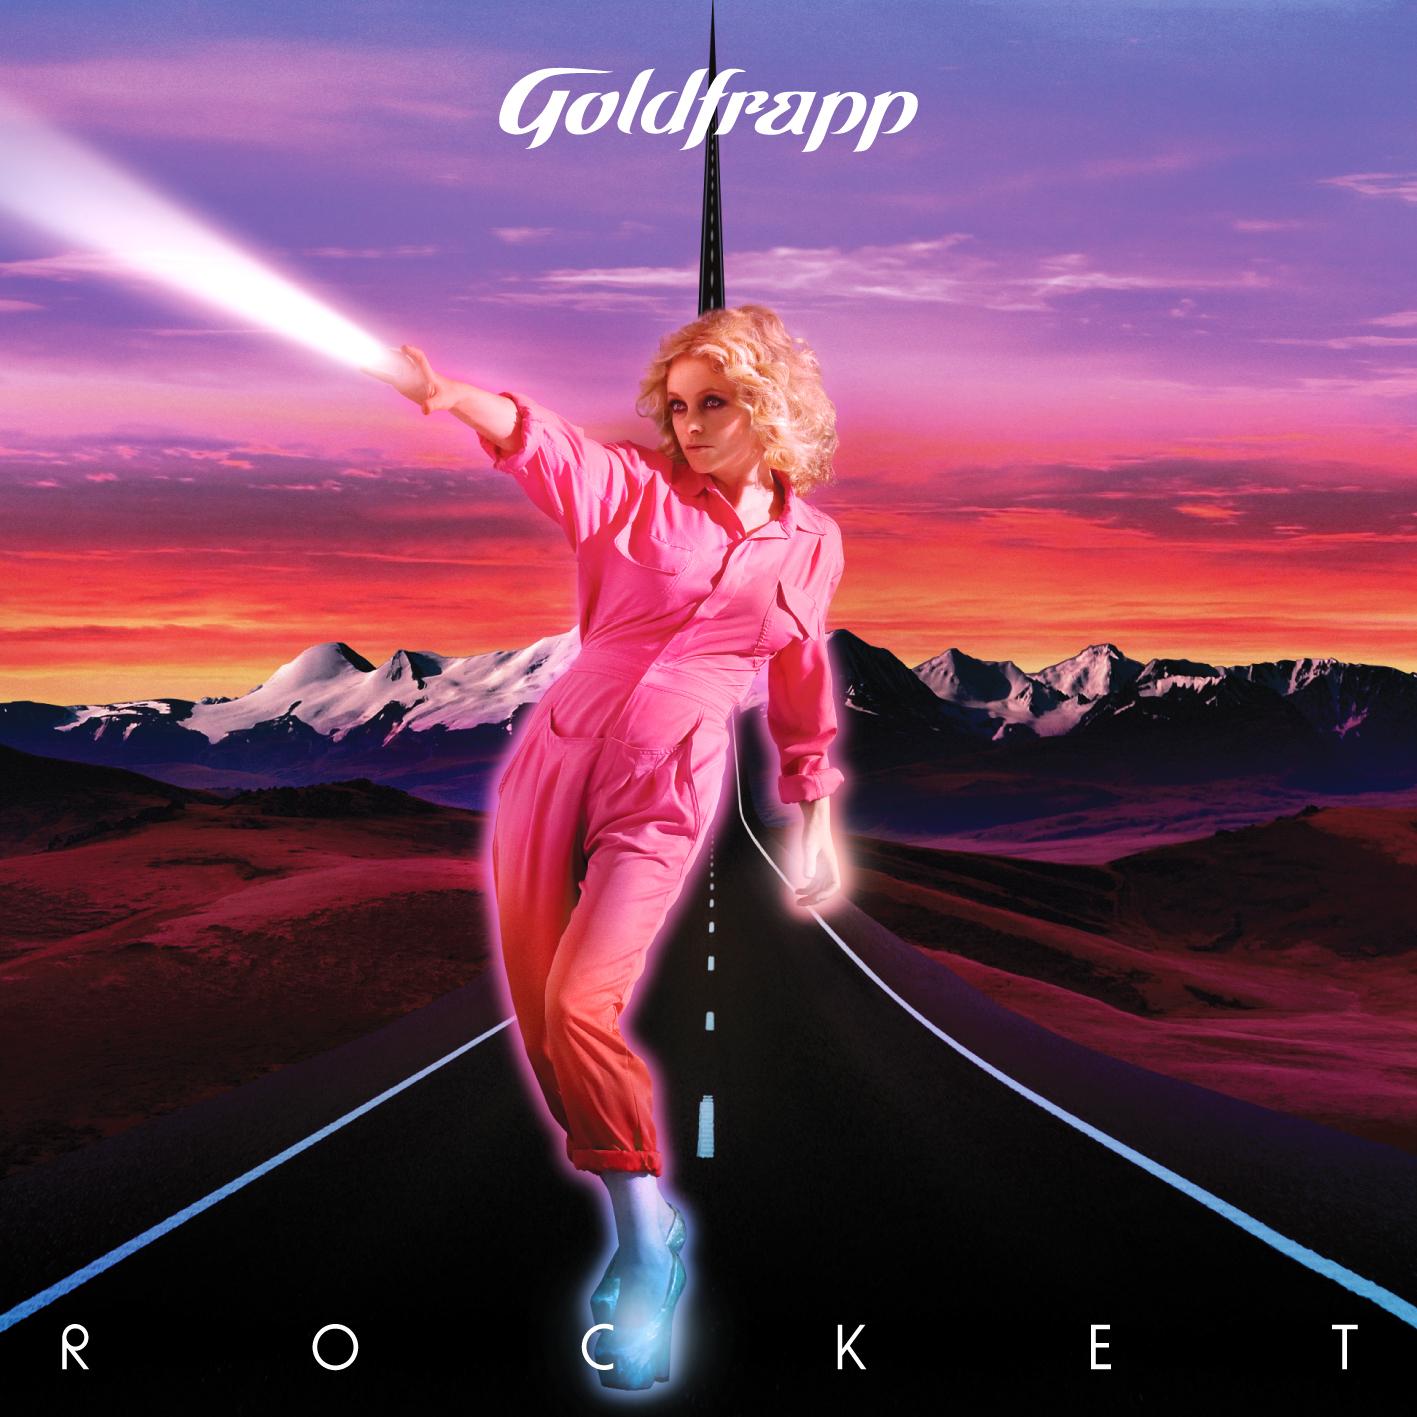 goldfrapp_rocket.jpg